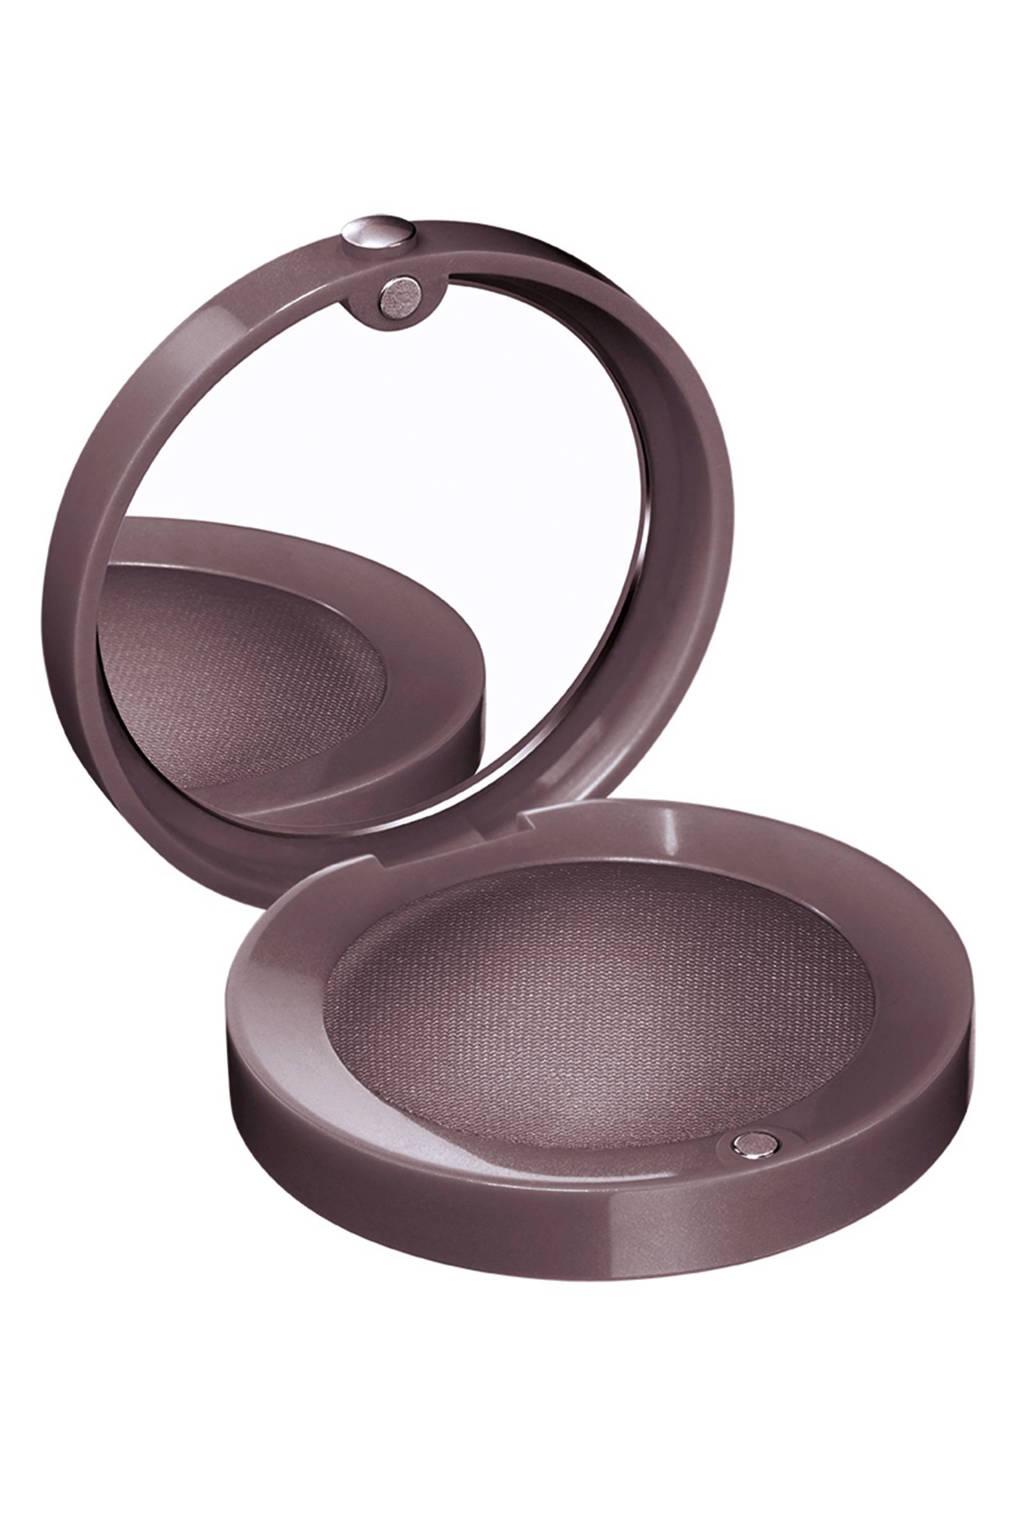 Bourjois Little Round Pot oogschaduw - 08 Noctam-brune